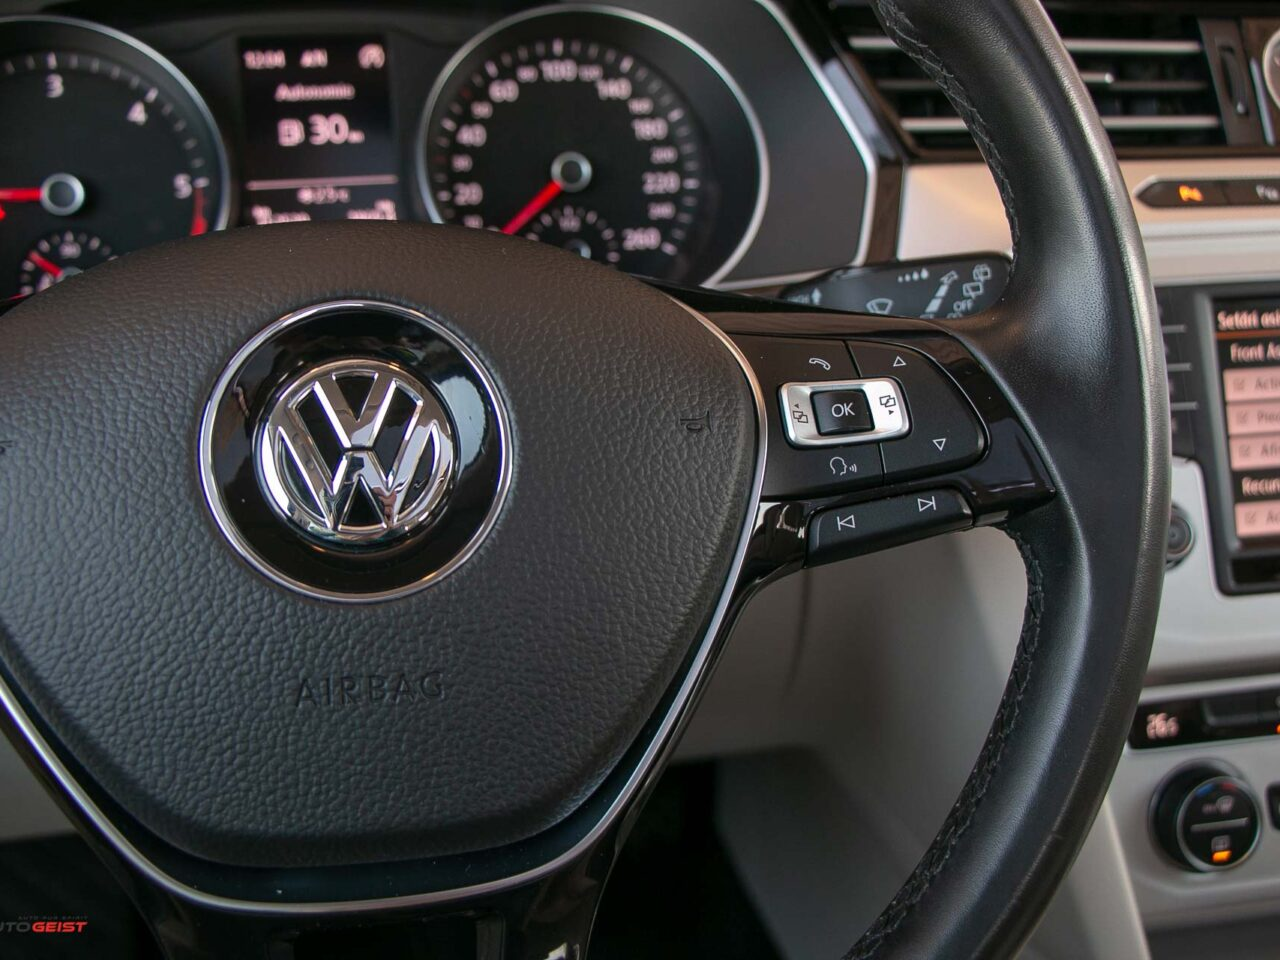 VW-PASSAT-break-panoramic-4516